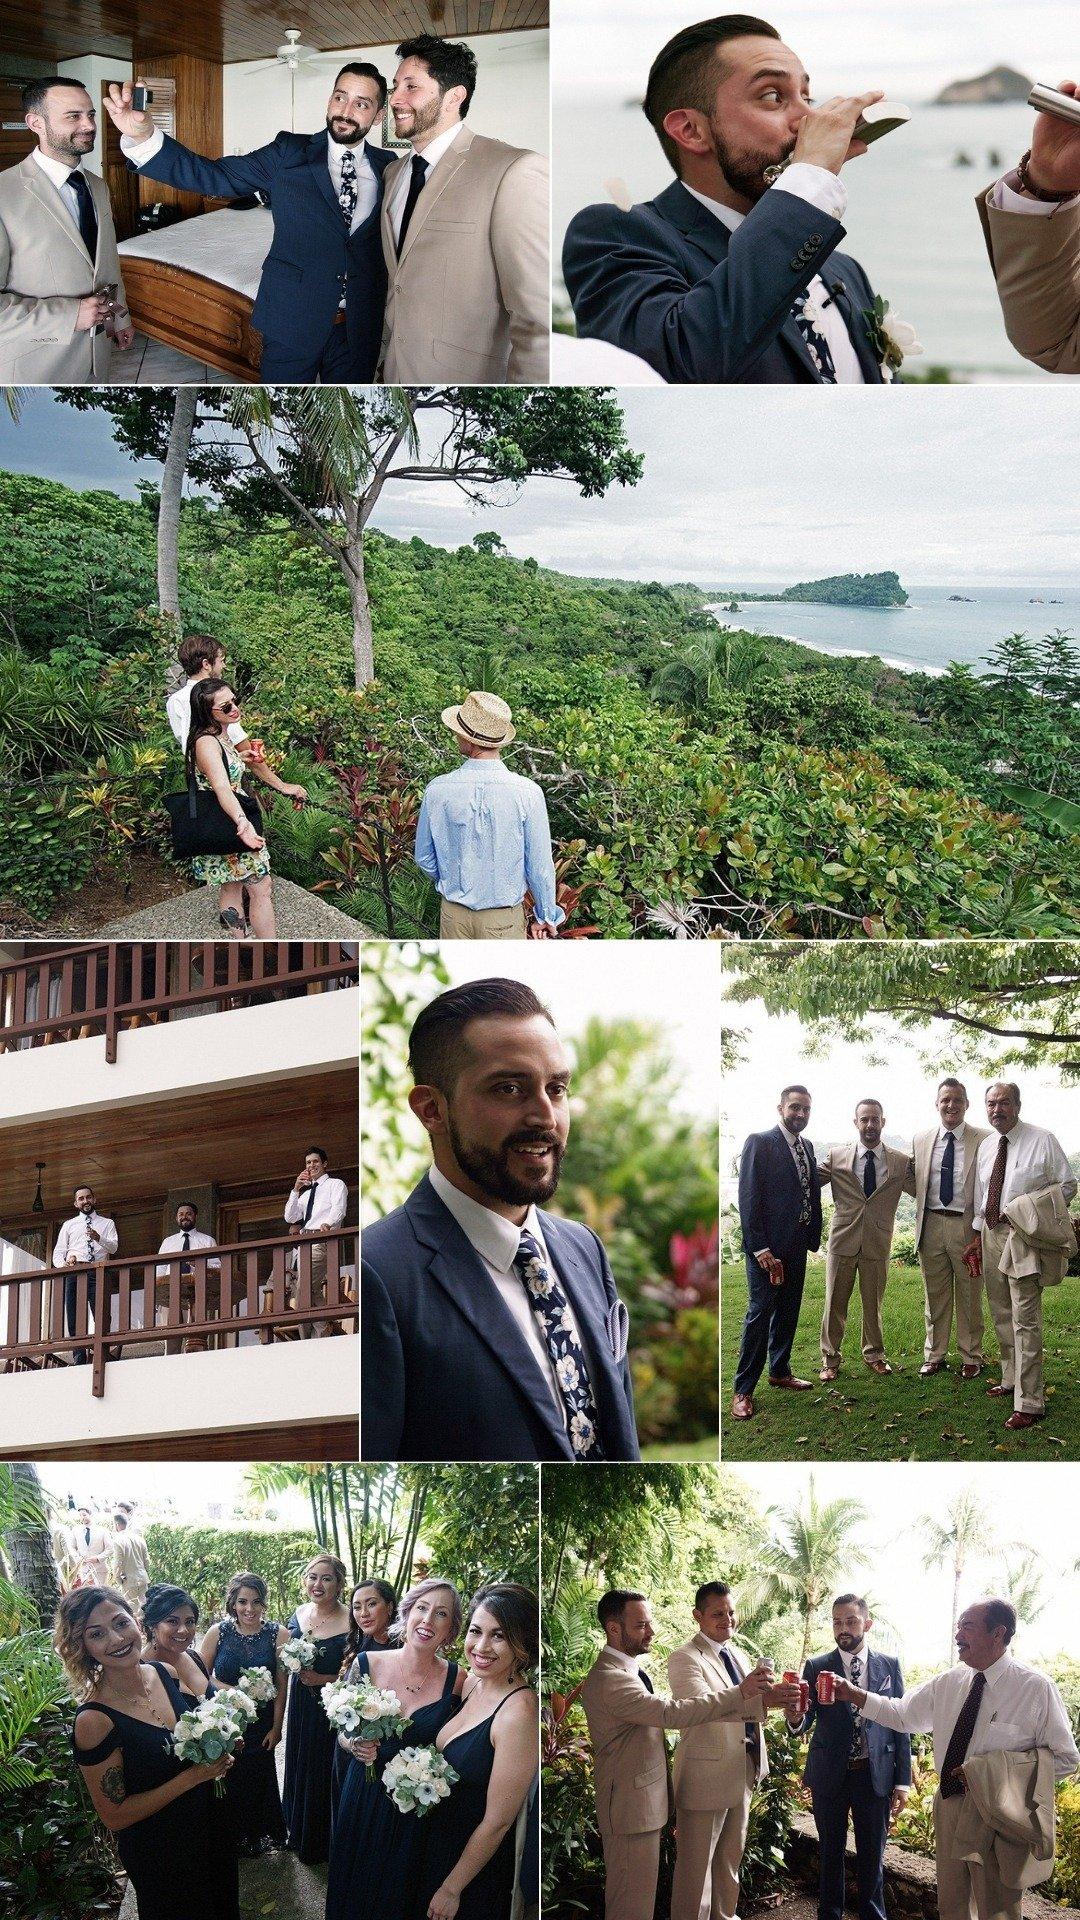 groomsmen attire at a quepos wedding in costa rica